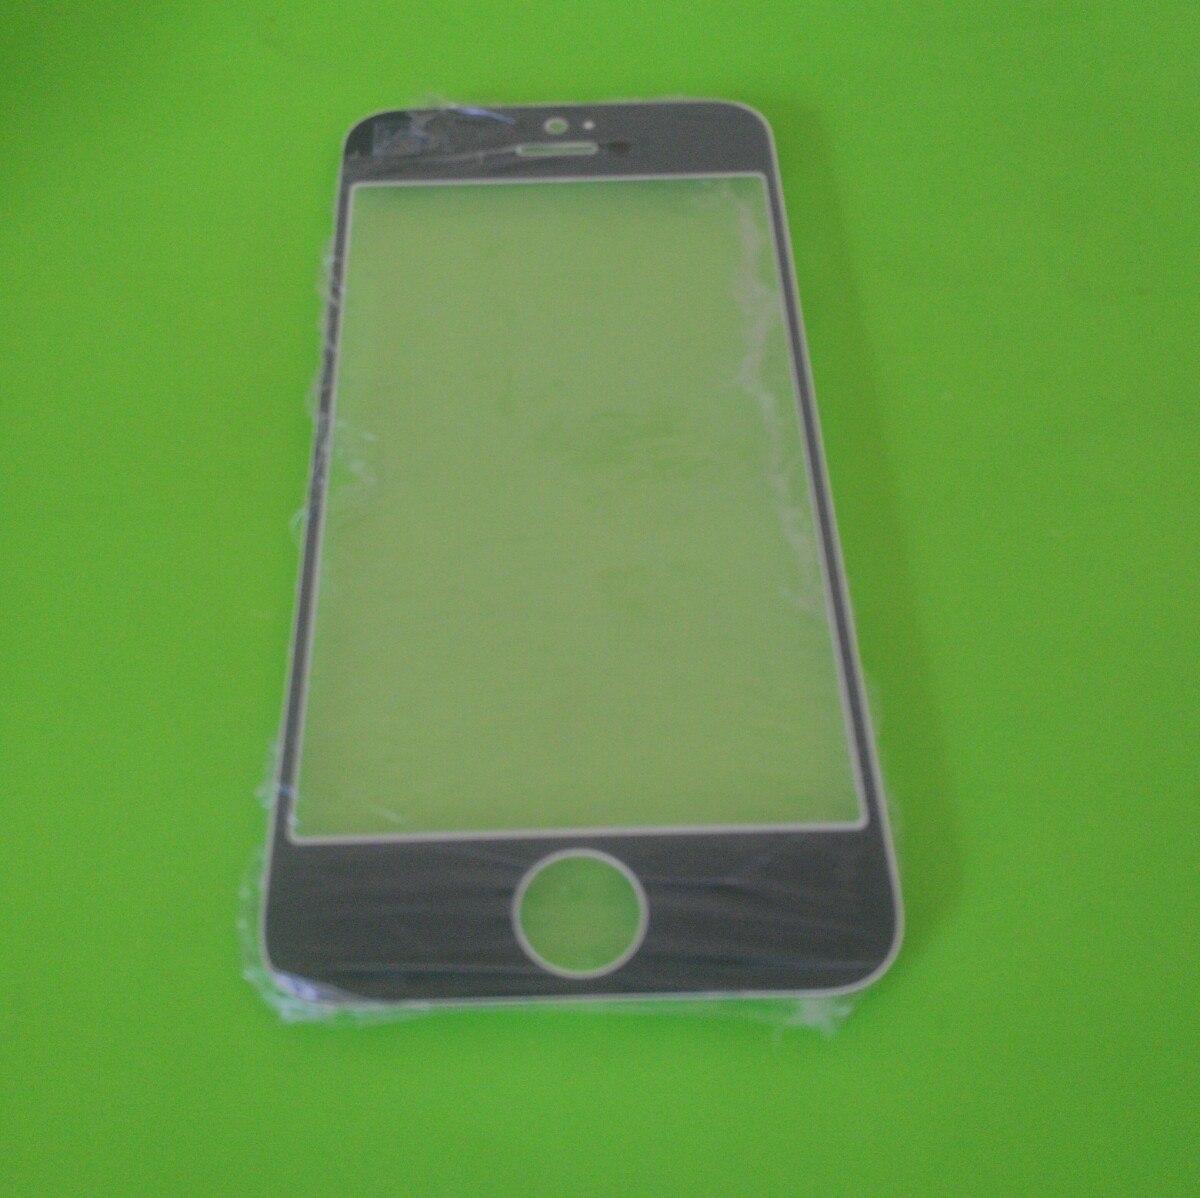 Vender Iphone  Roto